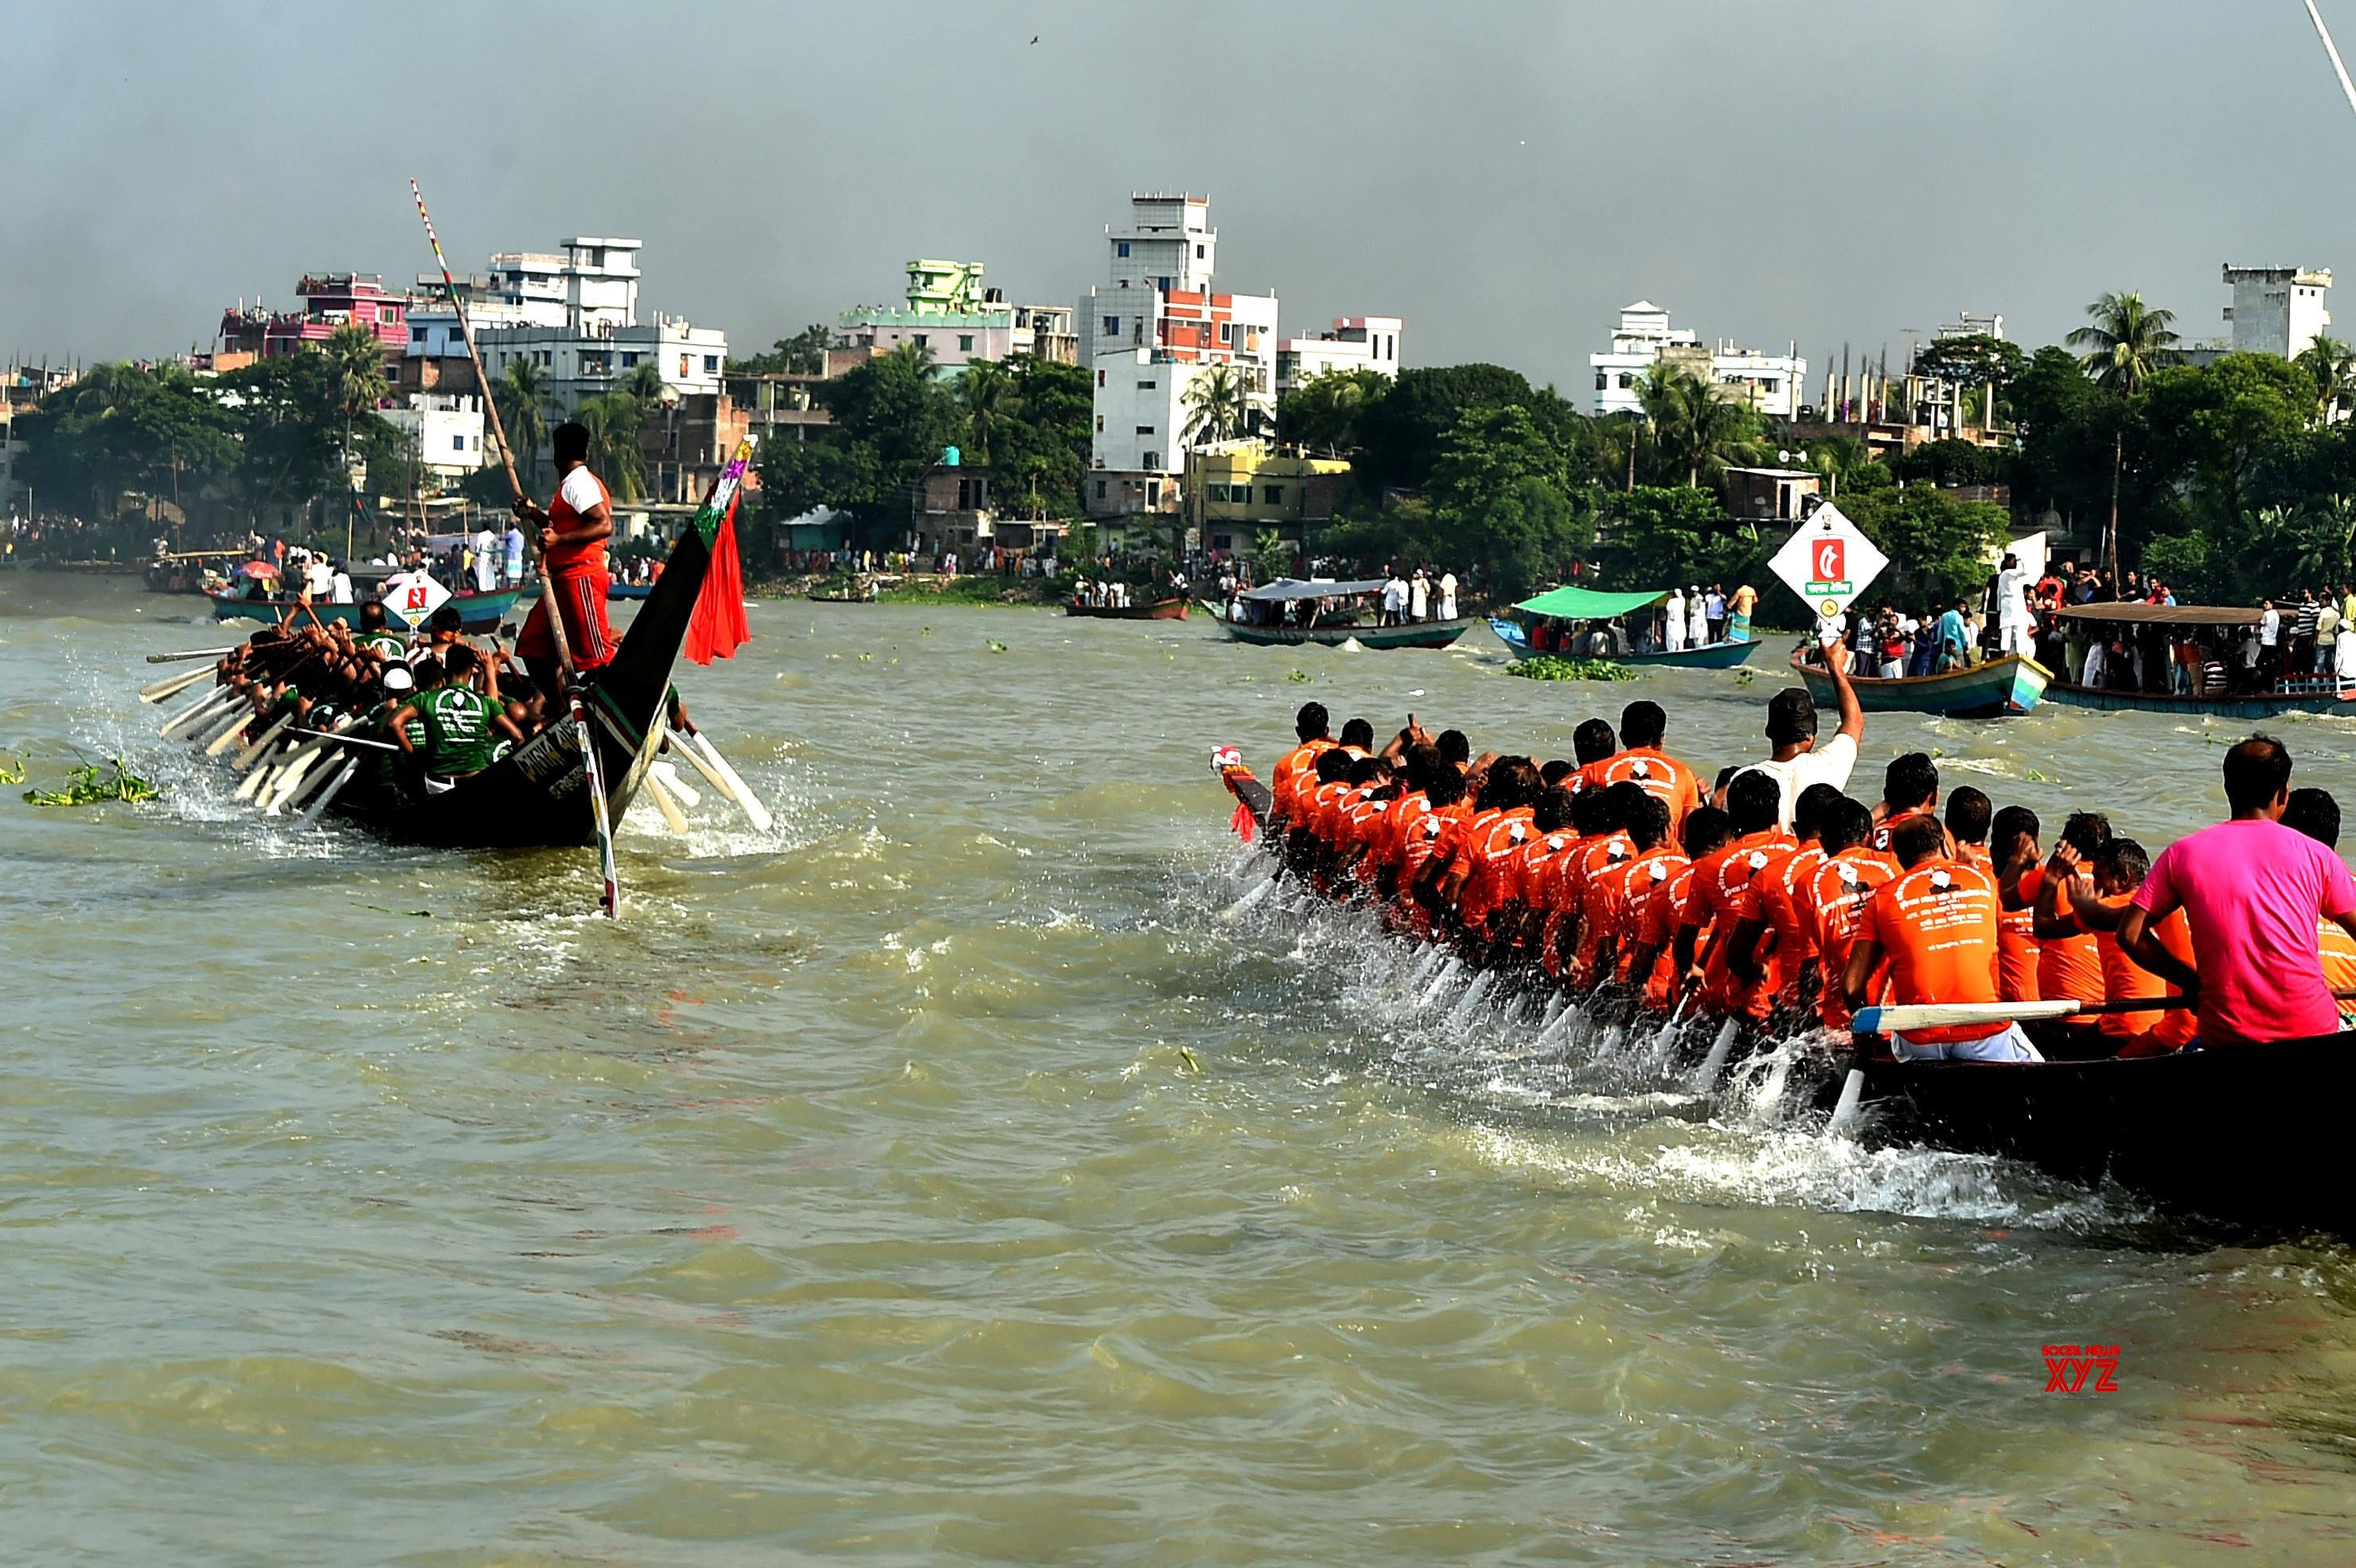 BANGLADESH - DHAKA - BOAT RACE #Gallery